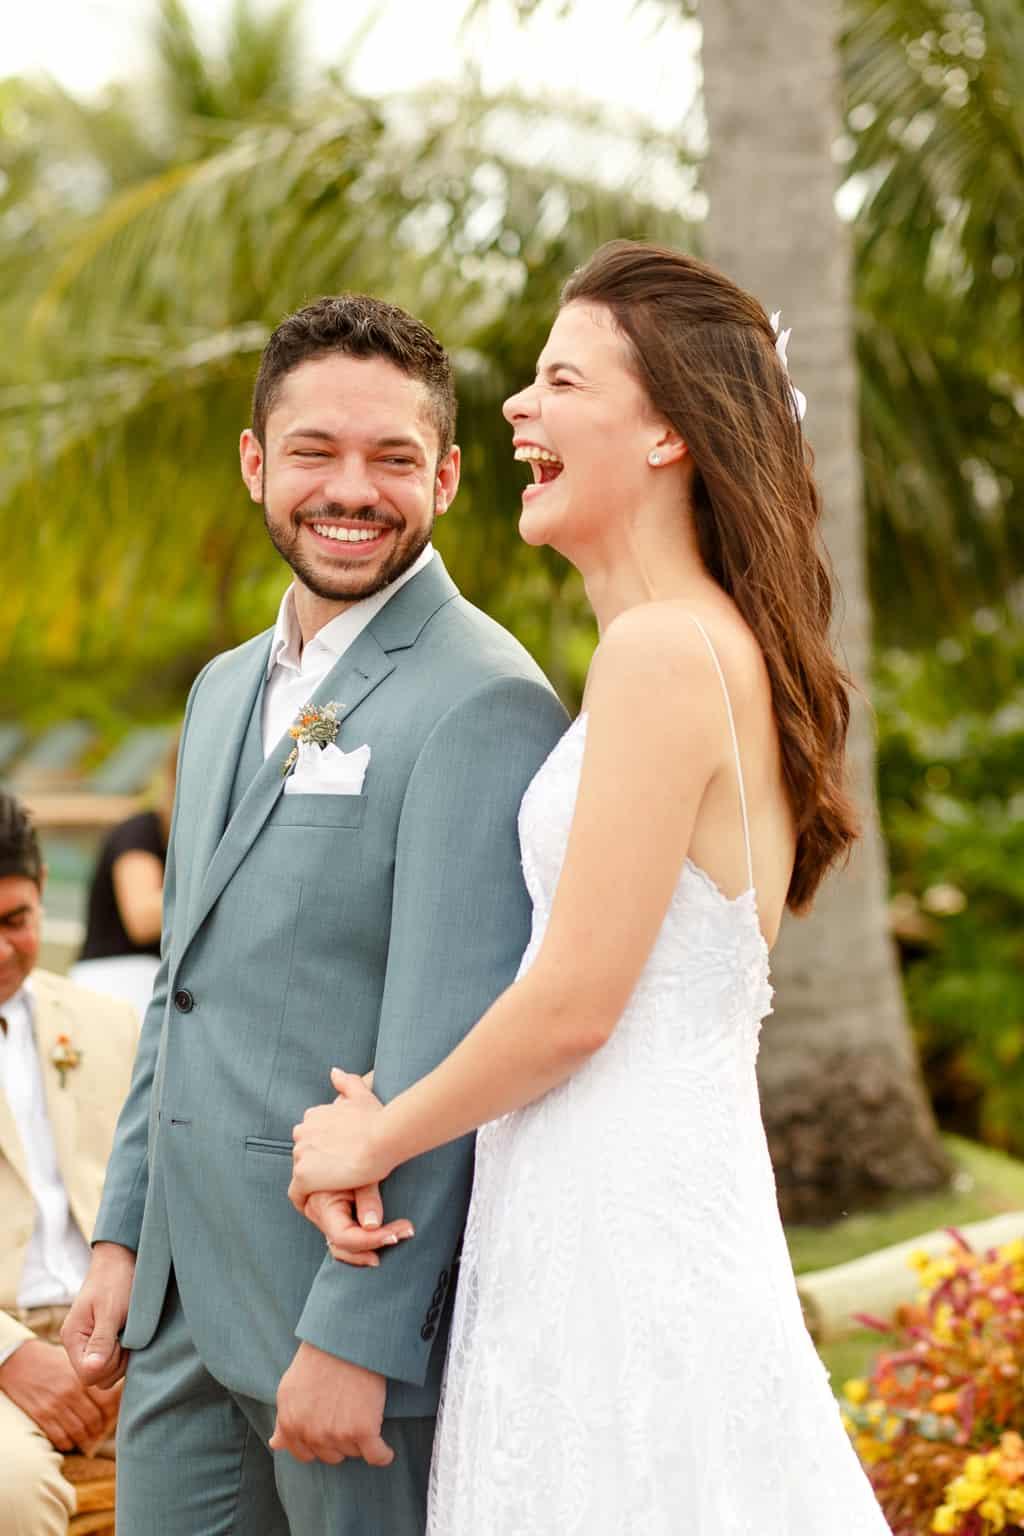 Casamento-Emanuelle-e-Alysson-Fotografia-Tadeu-Nanó-e-Luca-Antunes96-1